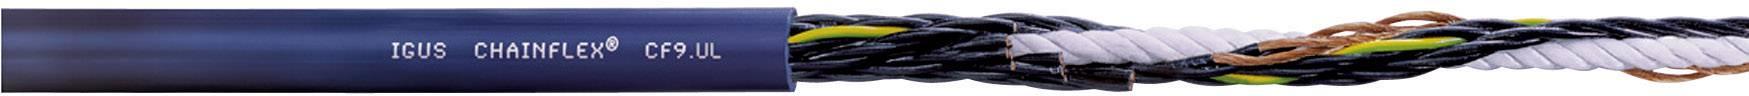 Řídicí kabelové vedení igus Chainflex® (CF9.03.04.INI), 4x 0,34 mm², Ø 11 mm, 1 m, modrá